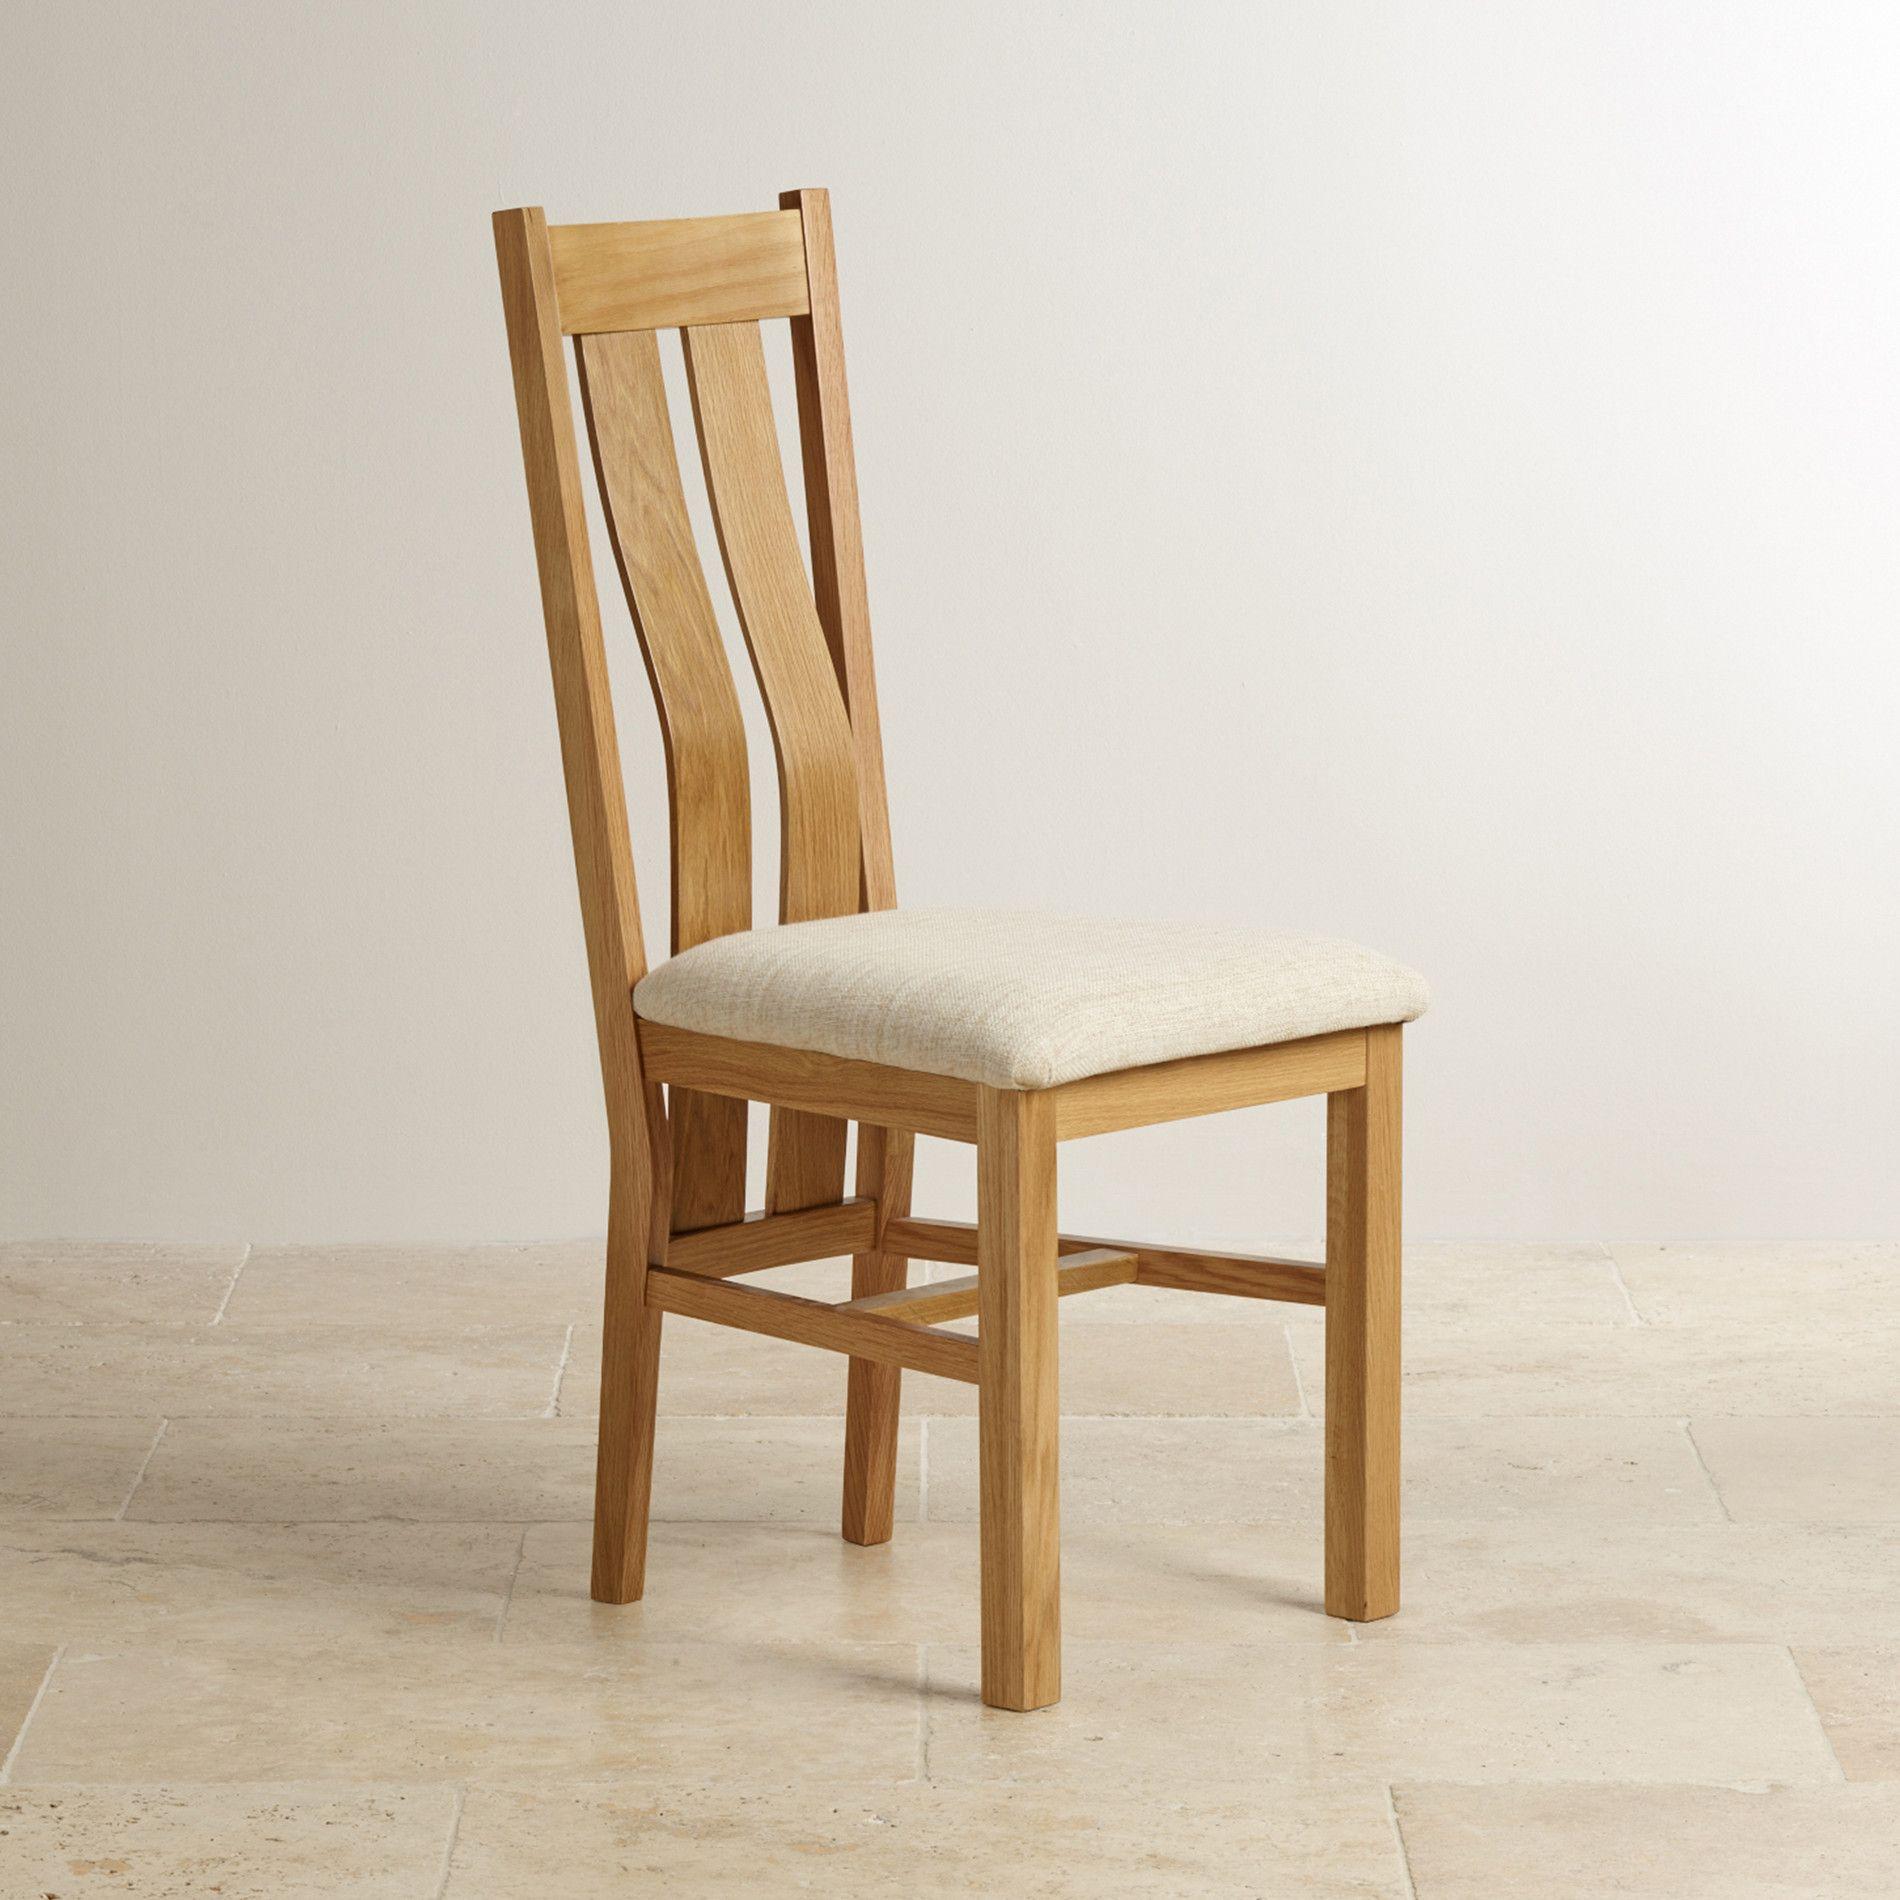 Dunkel Grau Stoff Stuhlen Gepolsterten Kuchenstuhlen Kunststoff Stuhlen Besetzt Dining Stuhl Weiss Gepol Oak Dining Sets Oak Dining Chairs Fabric Dining Chairs